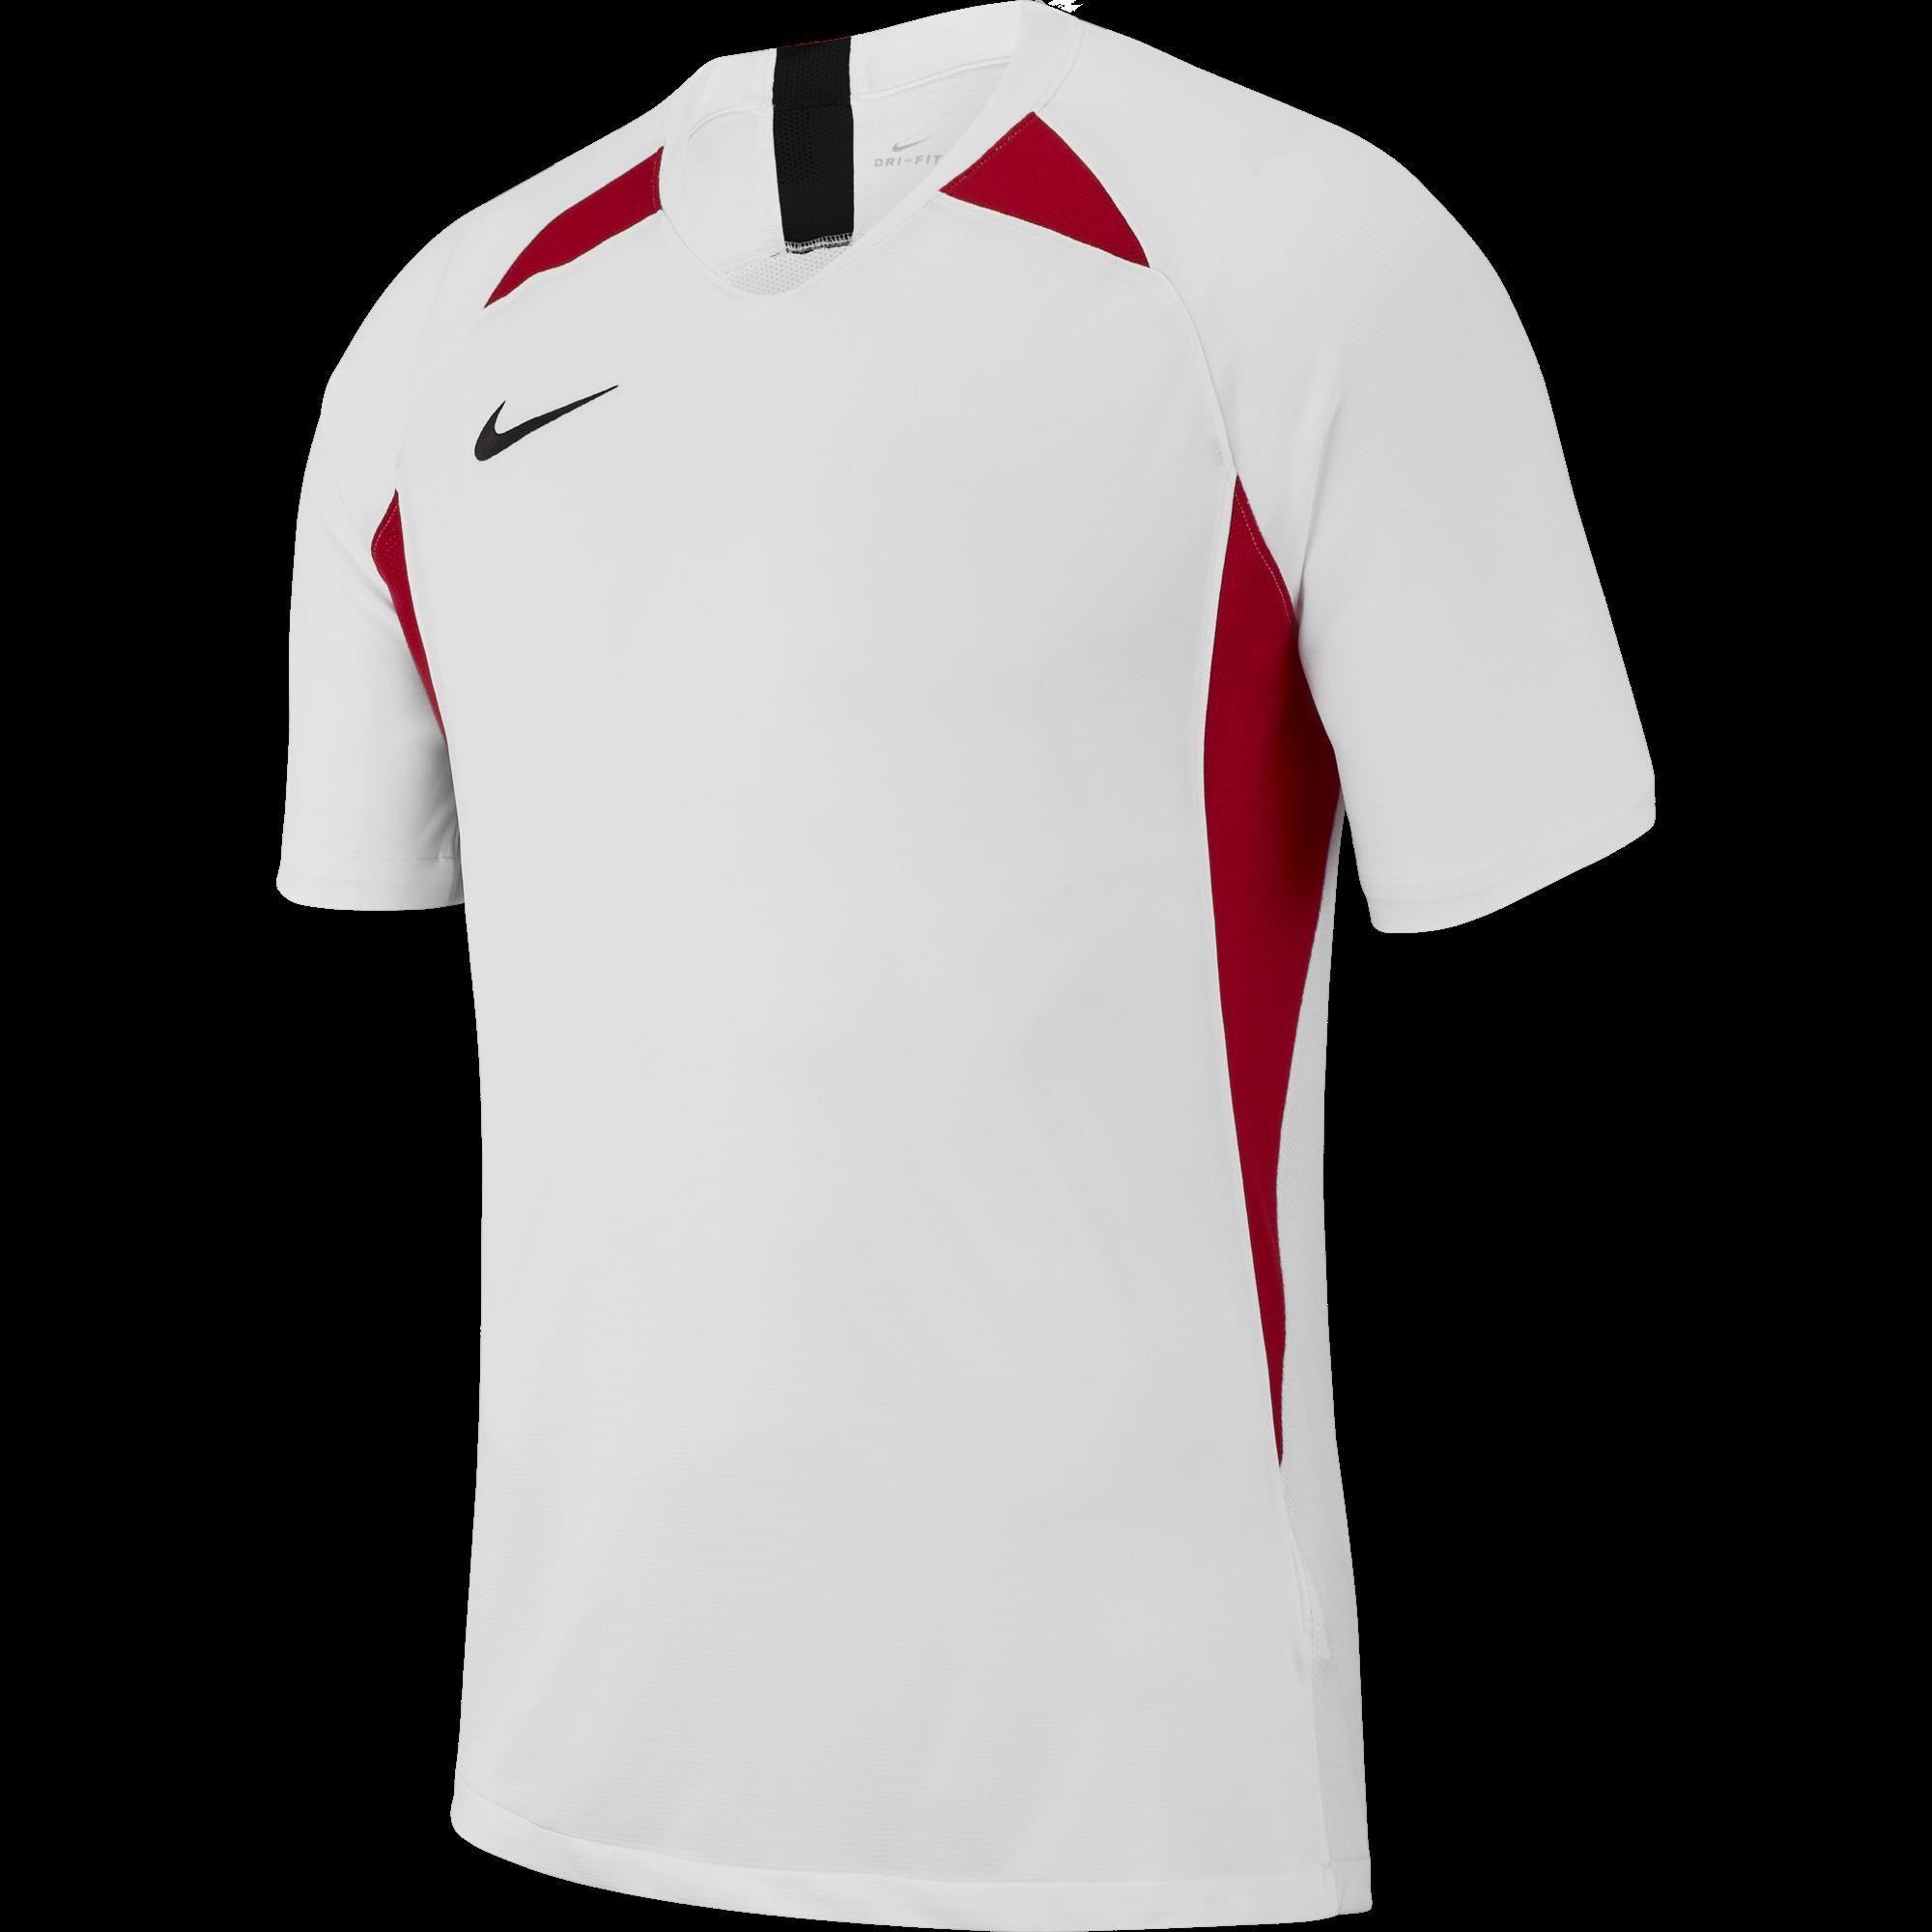 nike legend jersey white uni red black  16017 p